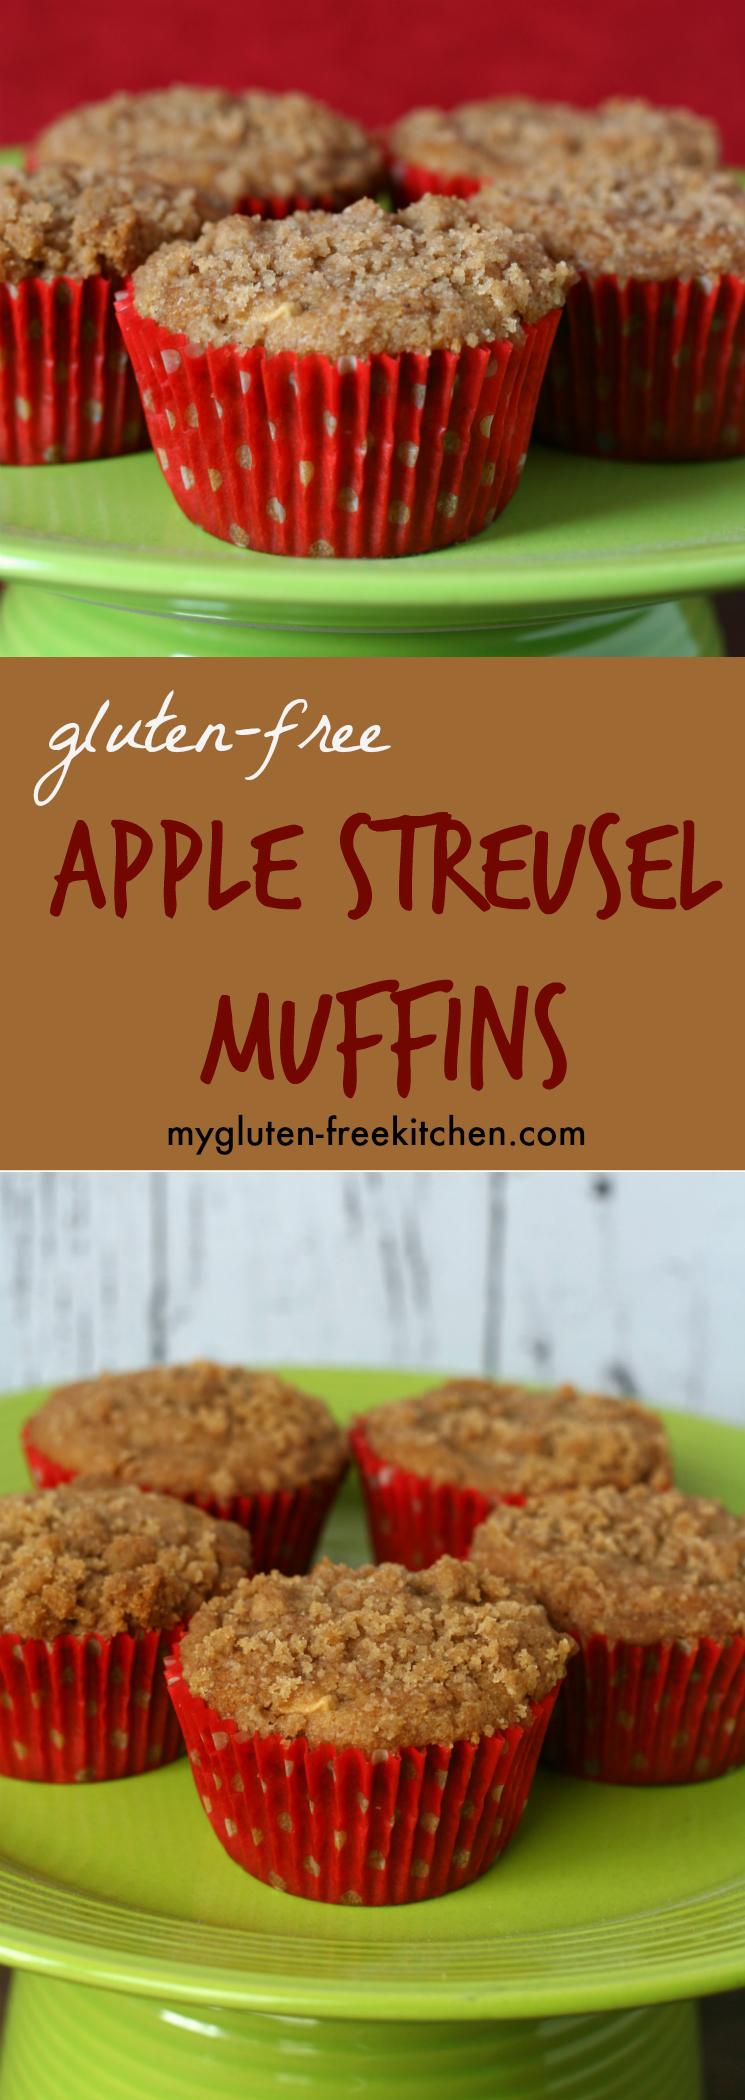 Gluten-free Apple Streusel Muffins Recipe. I love these!